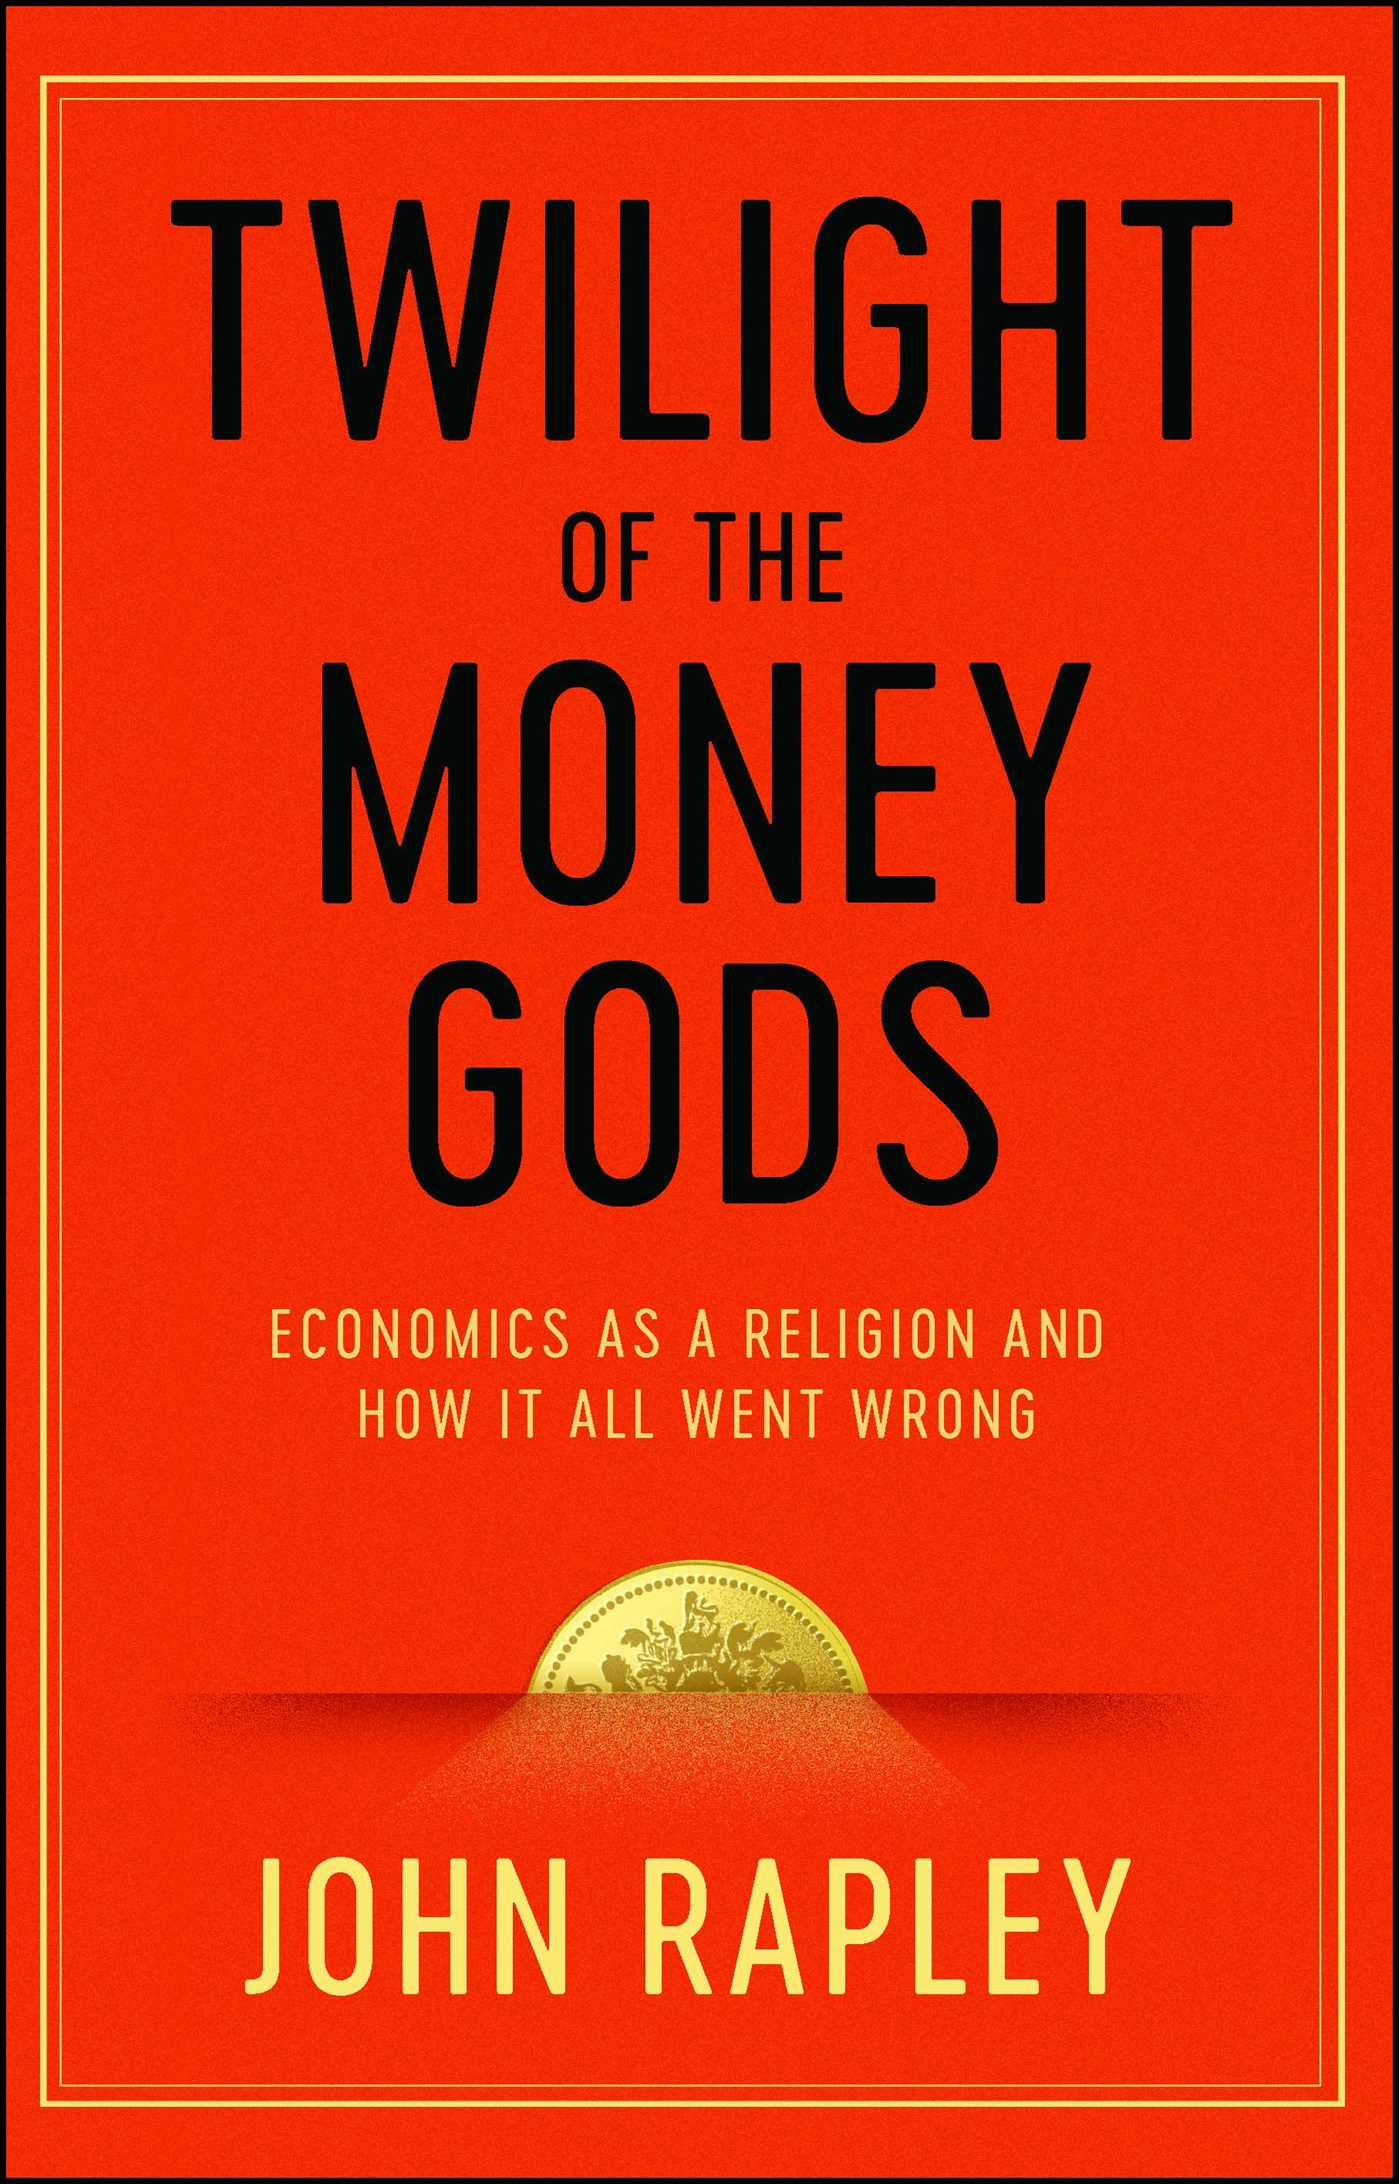 Twilight of the money gods 9781471152757 hr